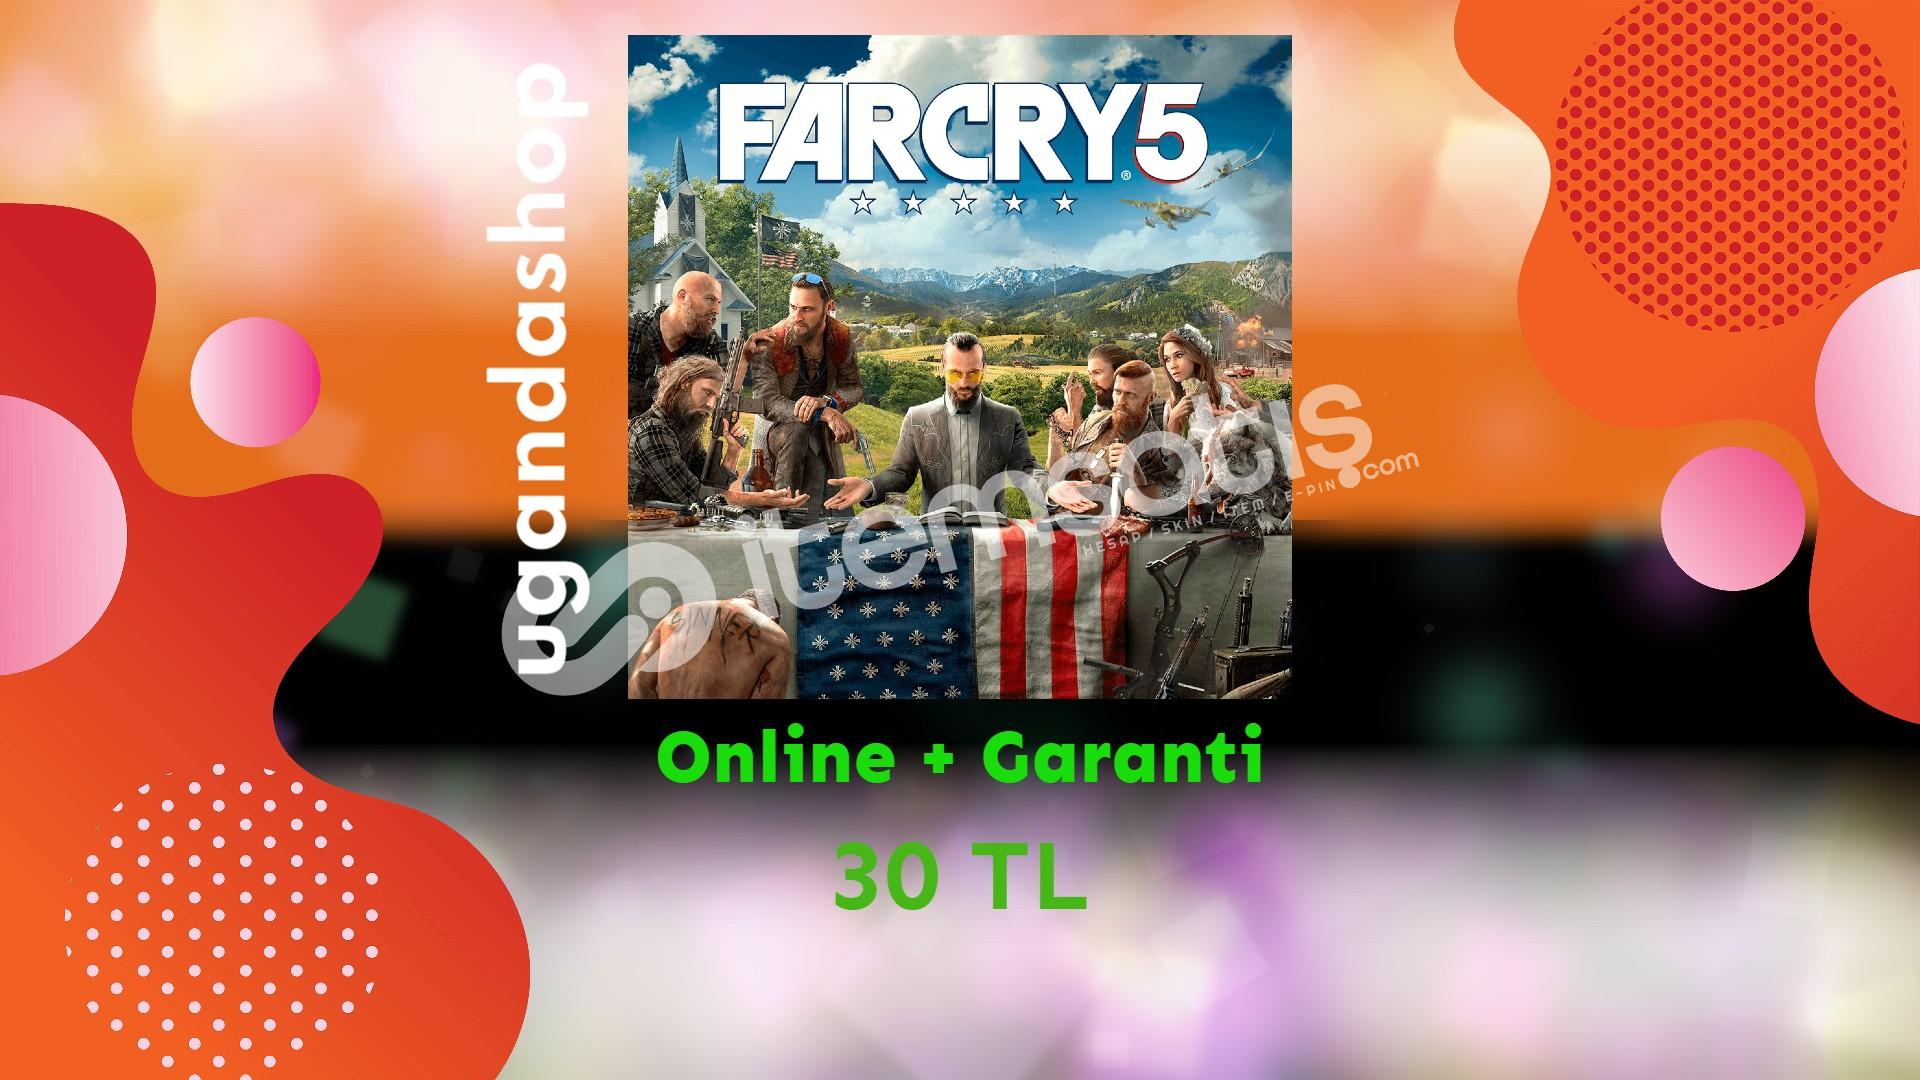 Far Cry 5 Online Uplay Hesap + Ömür Boyu Garanti